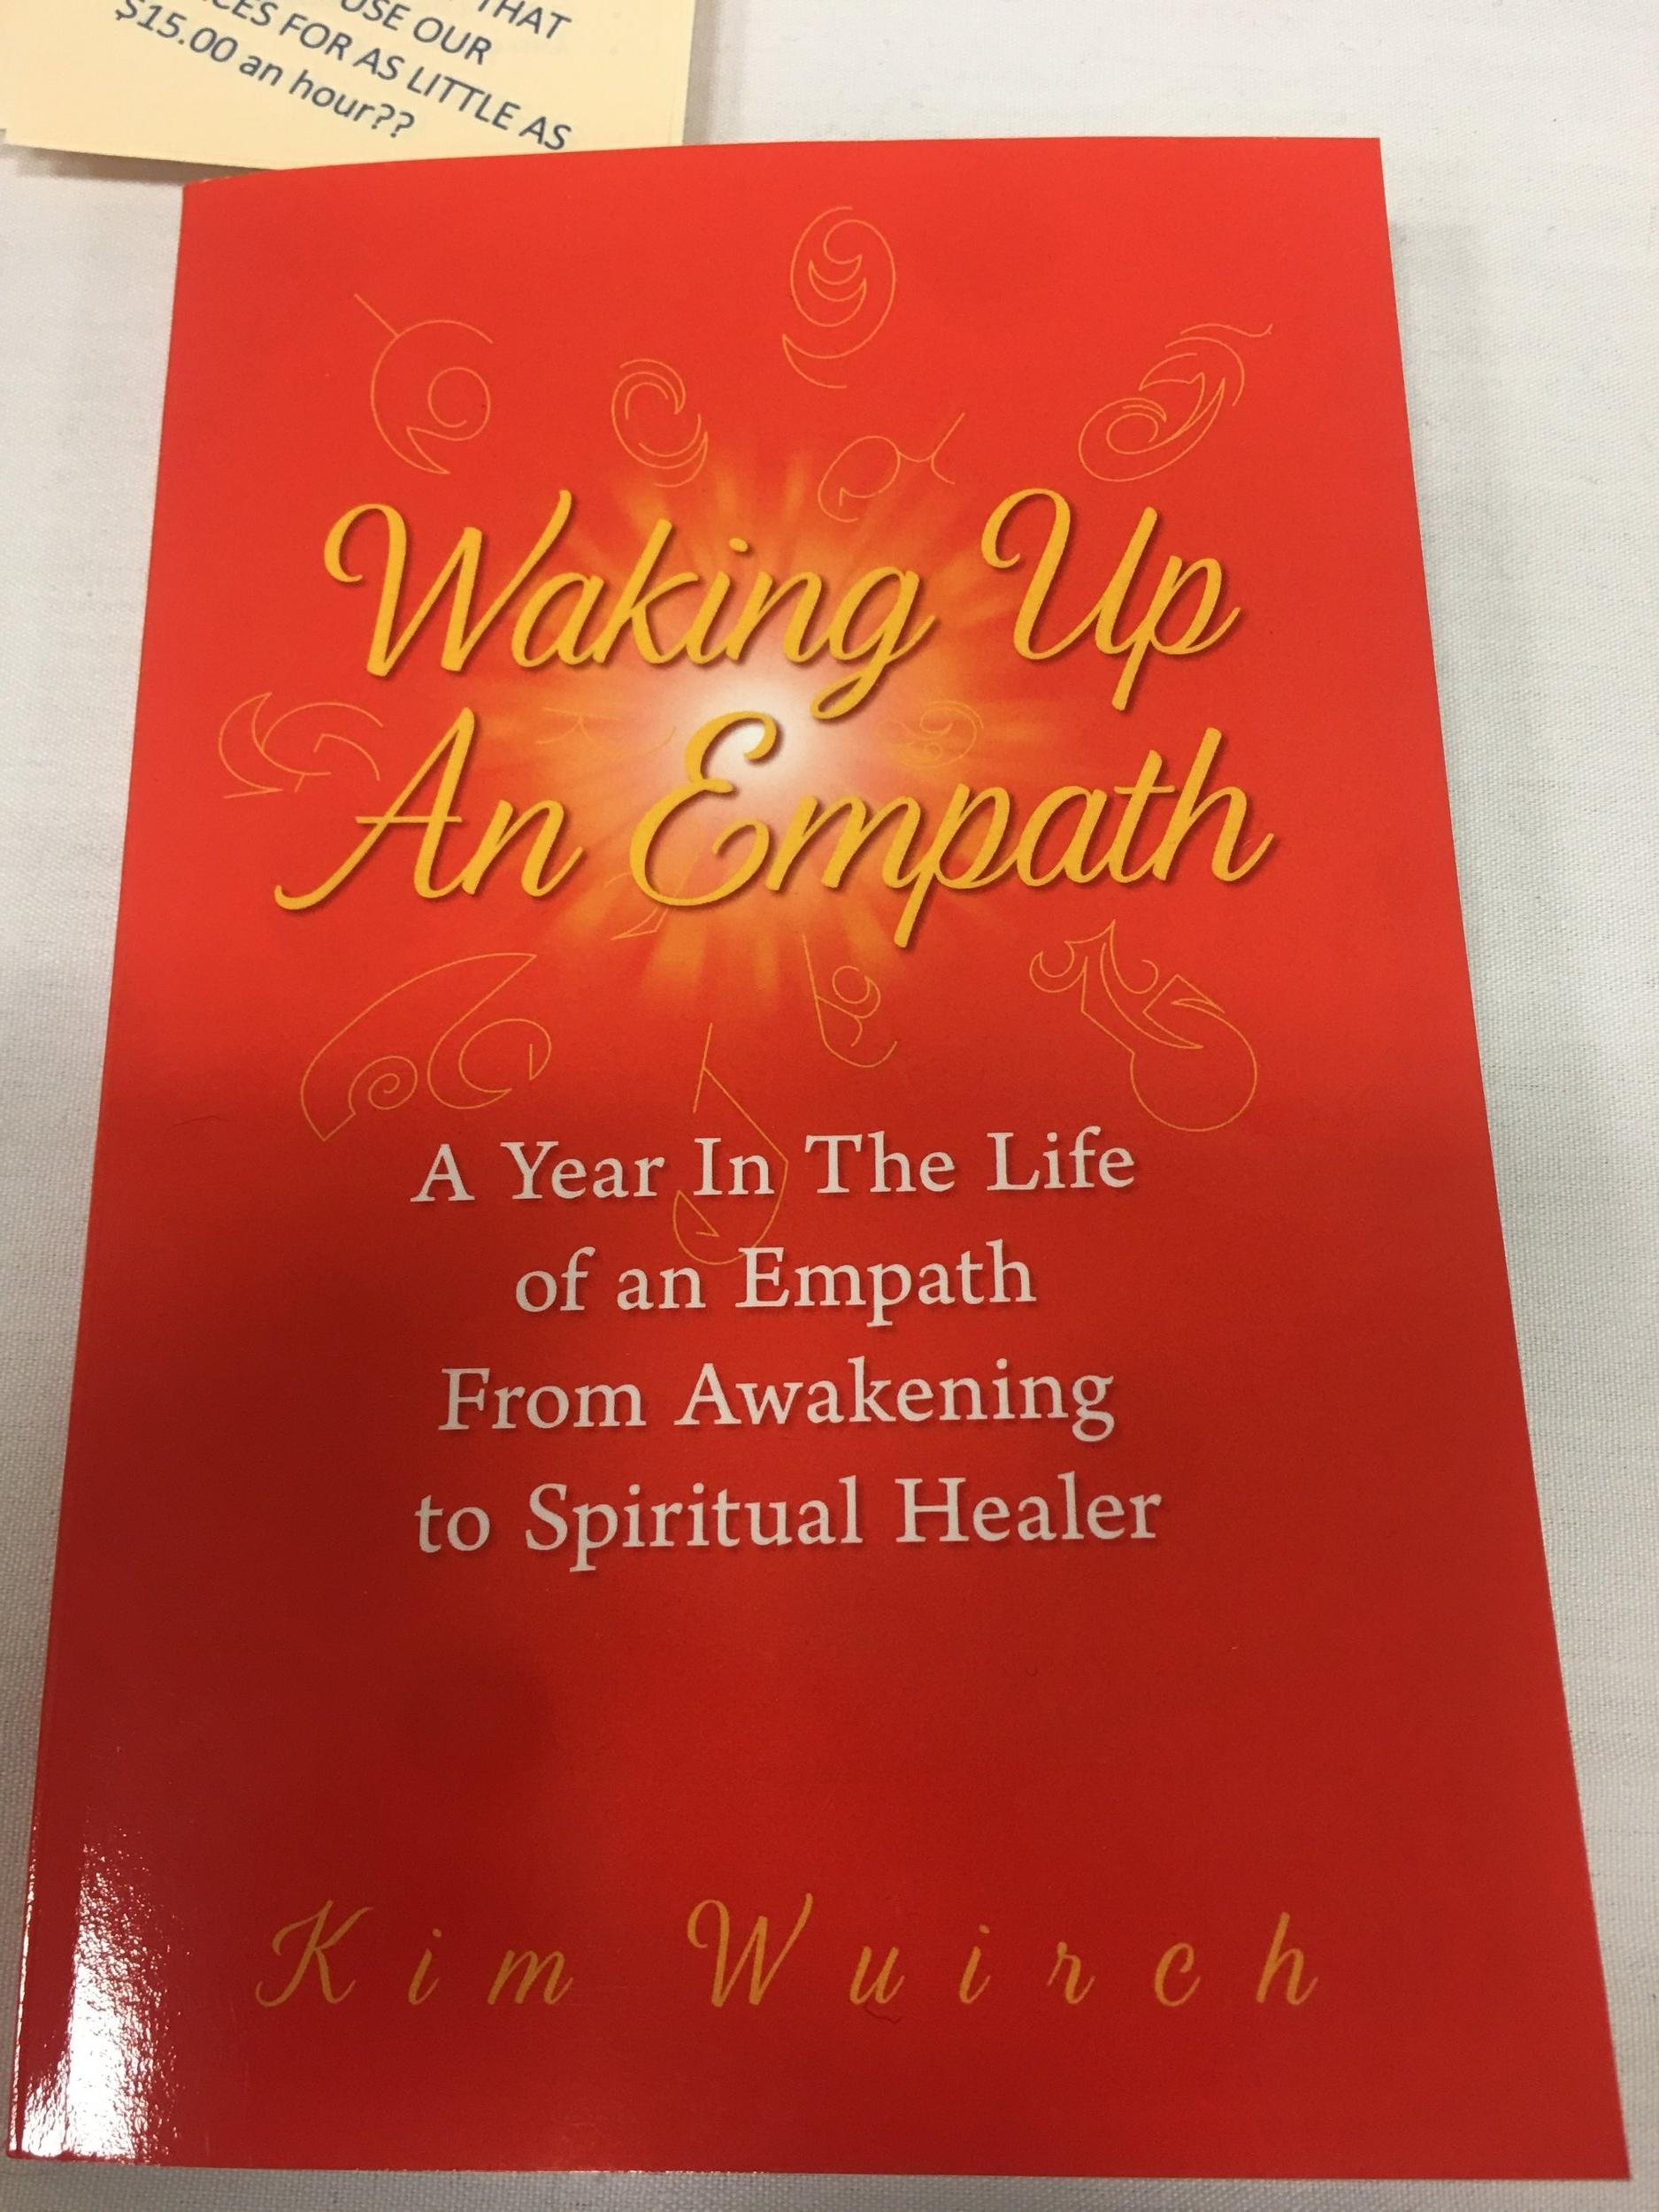 Waking up and empath.jpg